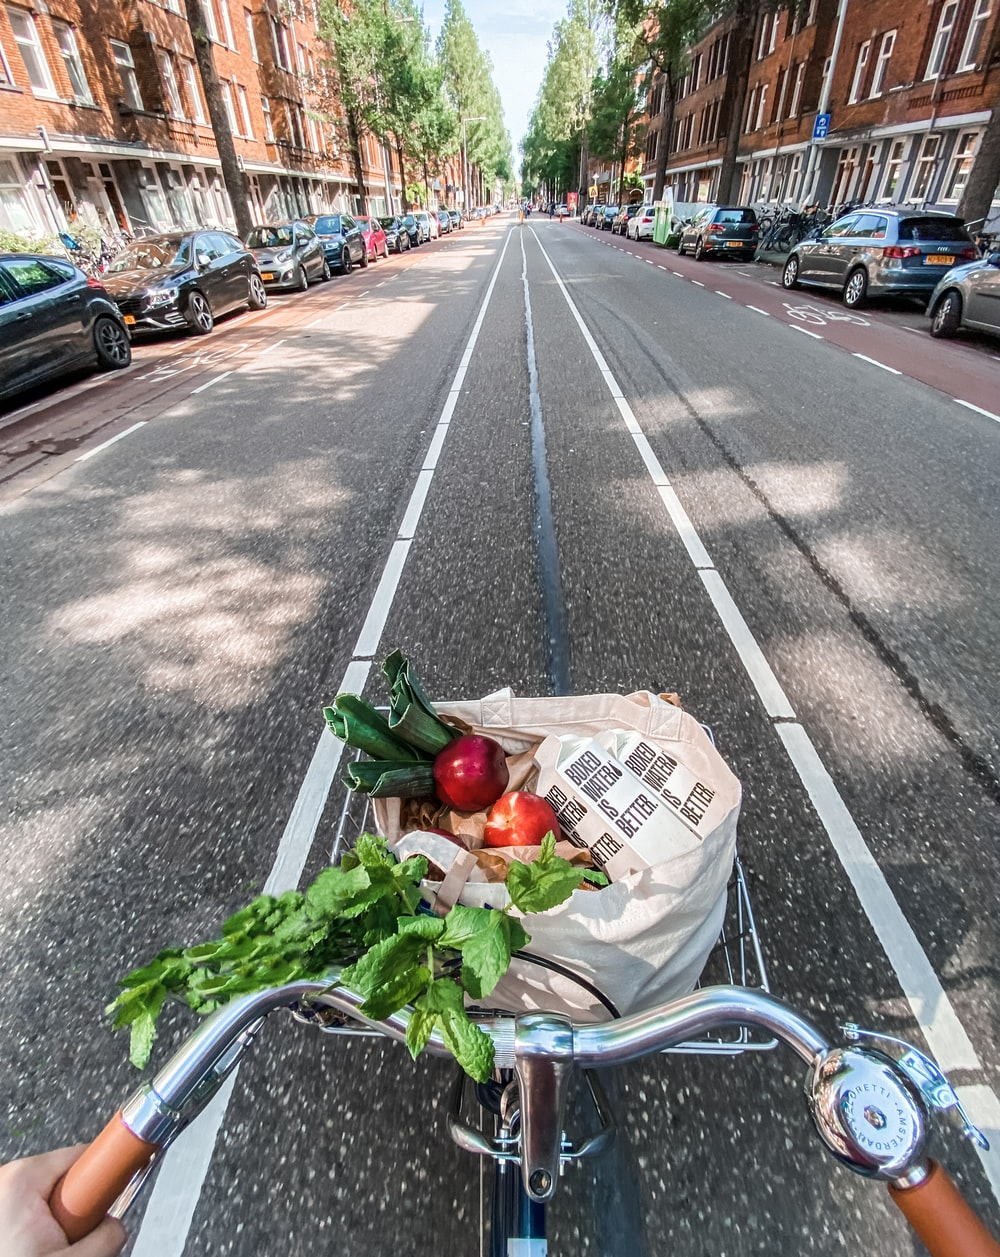 red roses in brown cardboard box on bicycle